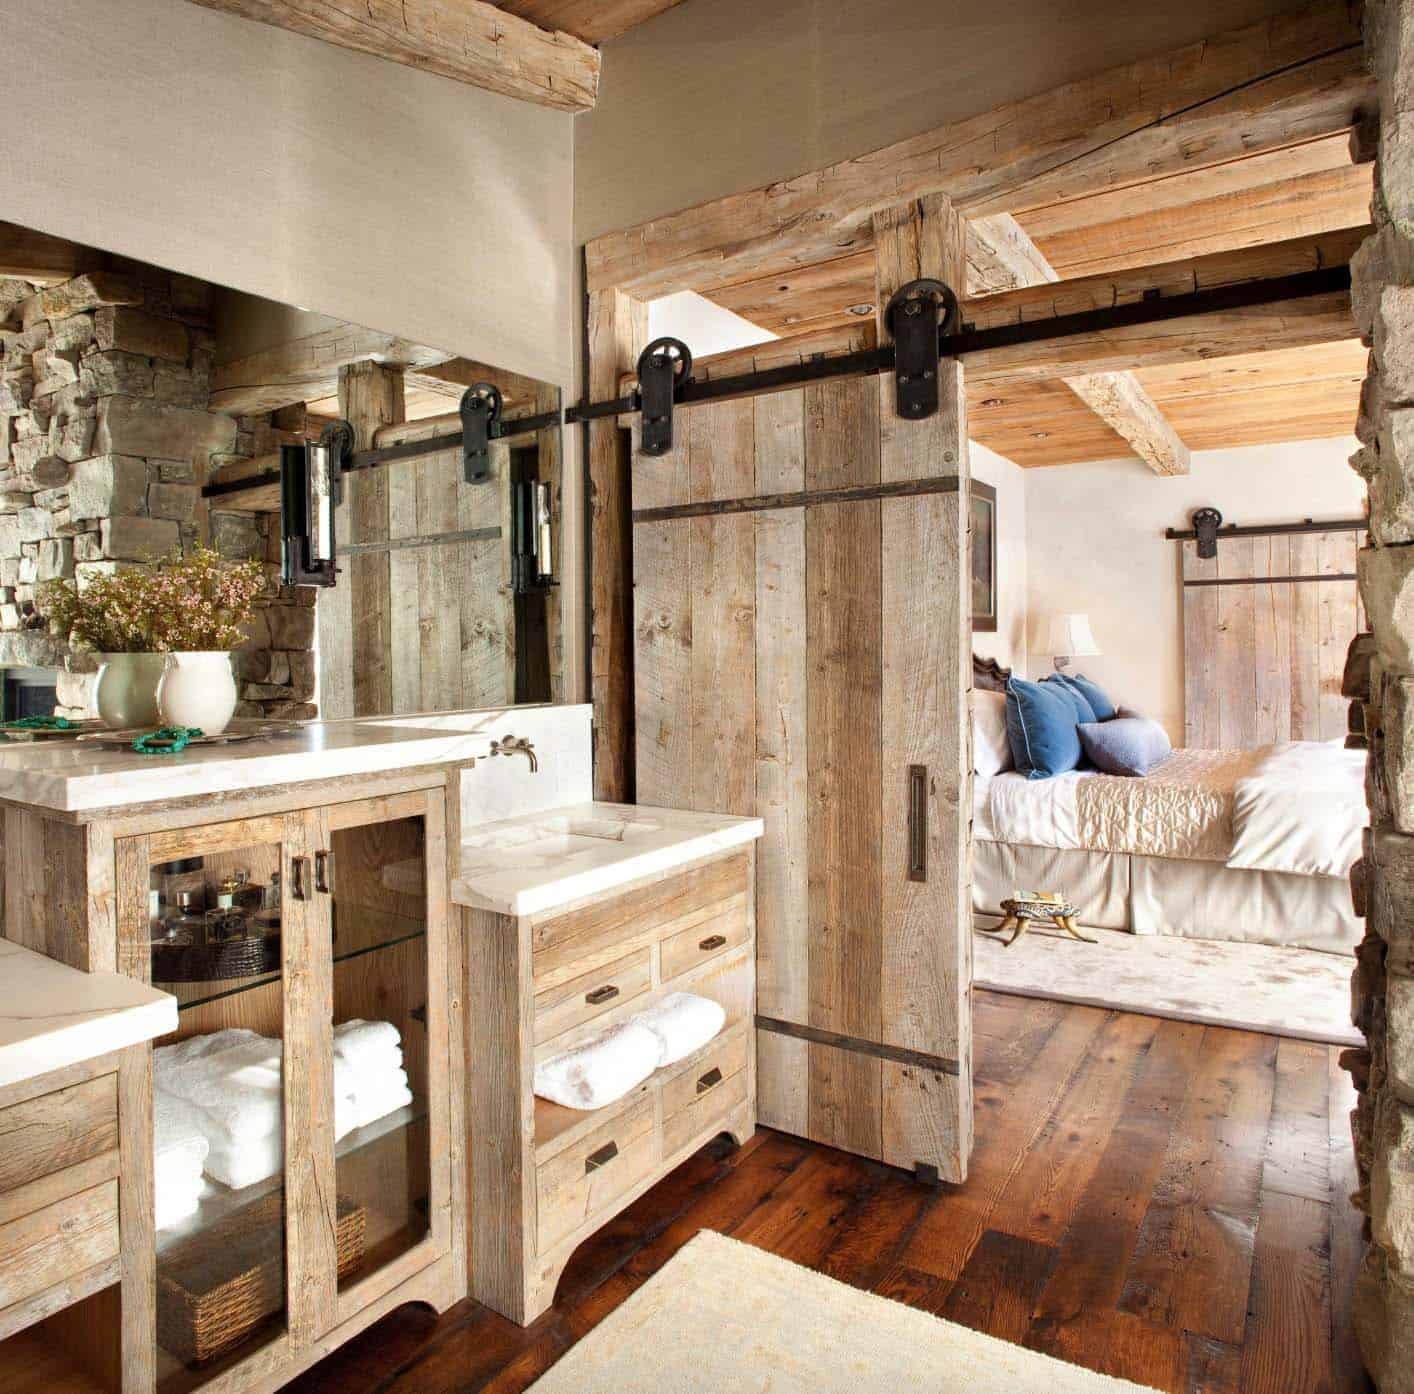 rustic-ski-lodge-retreat-bathroom-sliding-barn-door